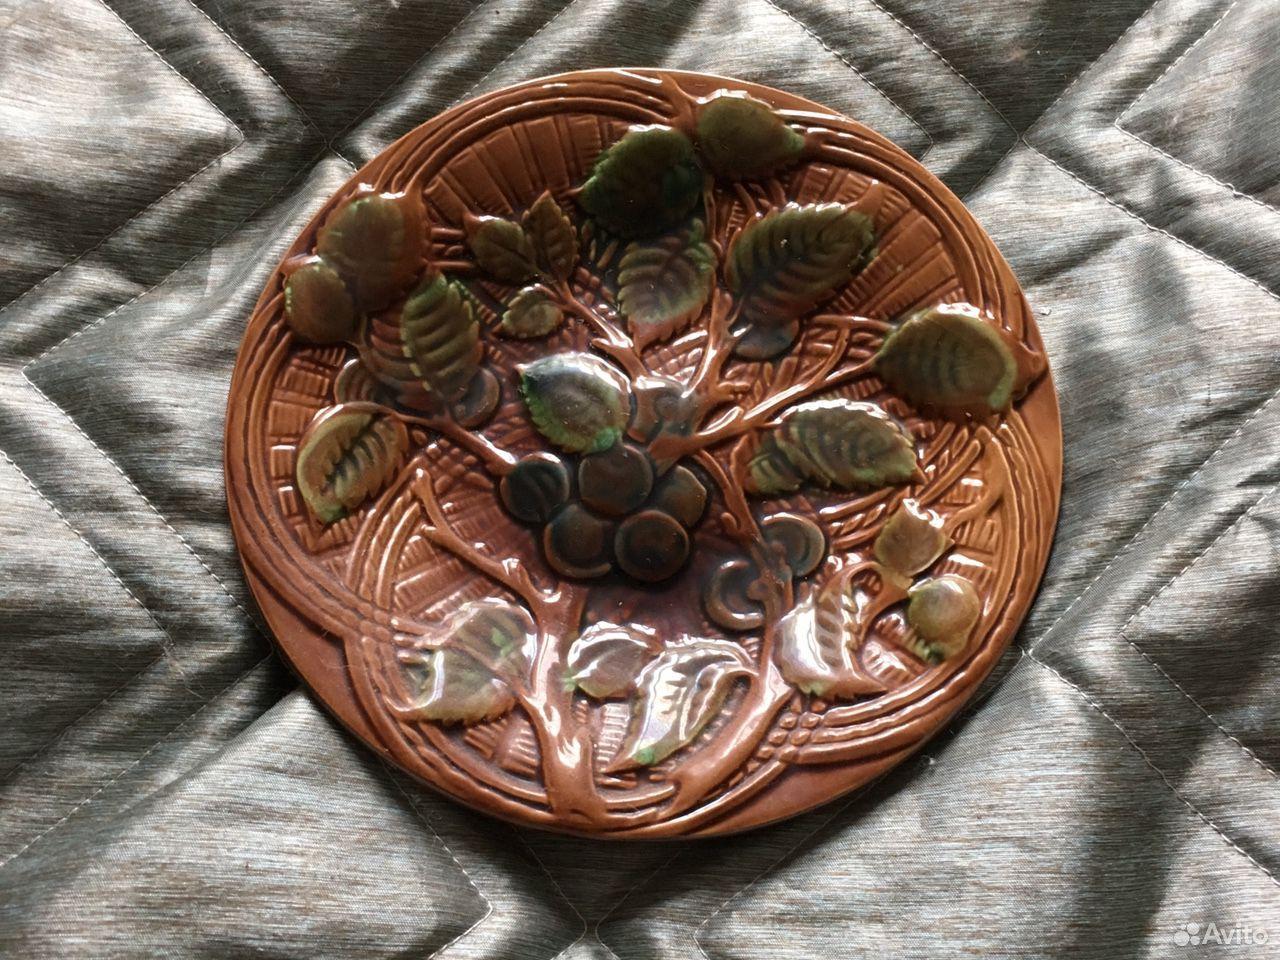 Тарелка настенная Конаково зик  89193693284 купить 1